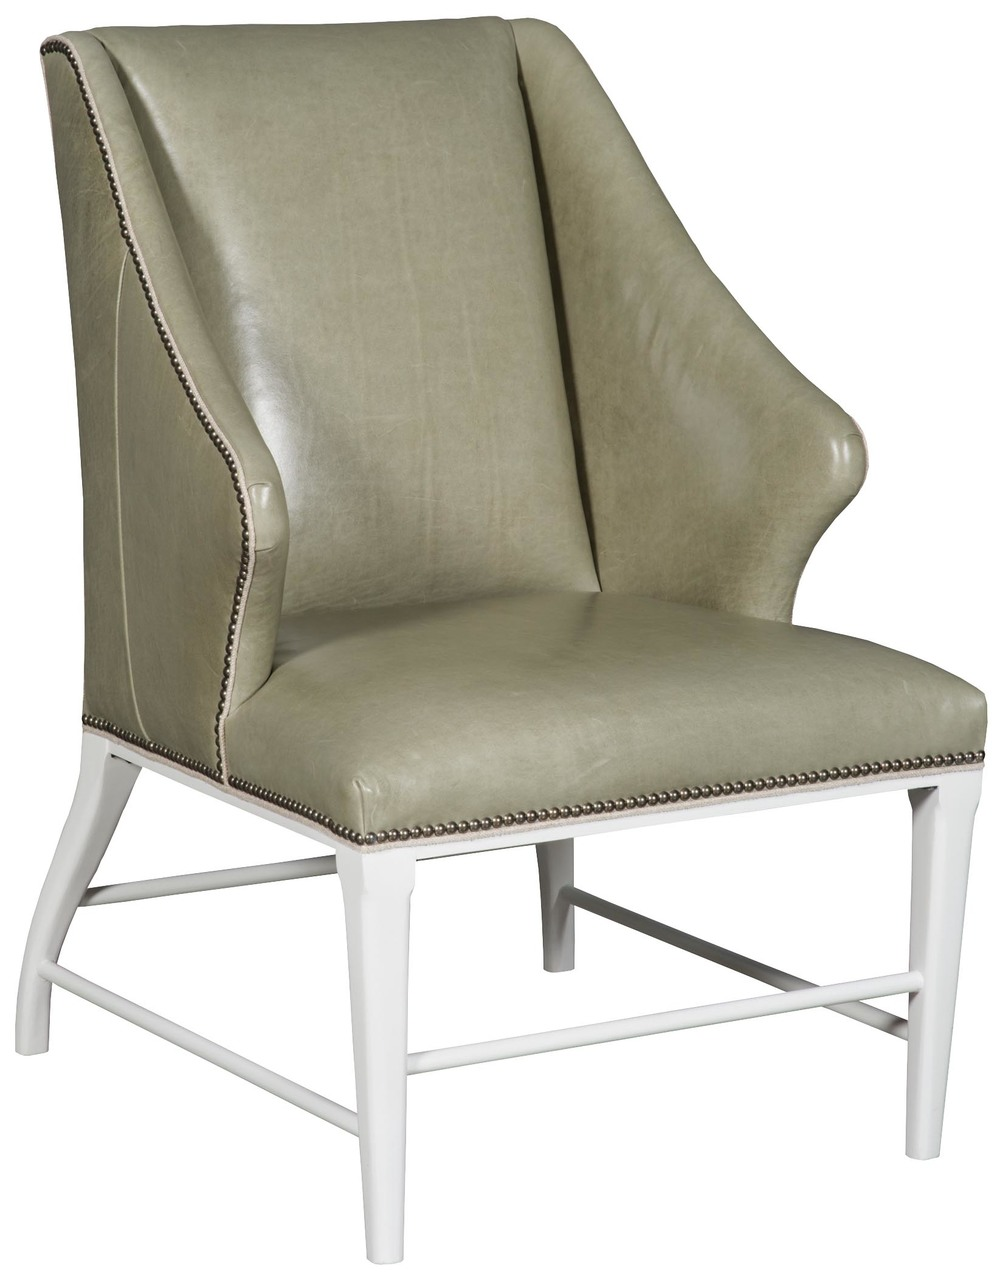 Vanguard Furniture - Jordan Dining Chair